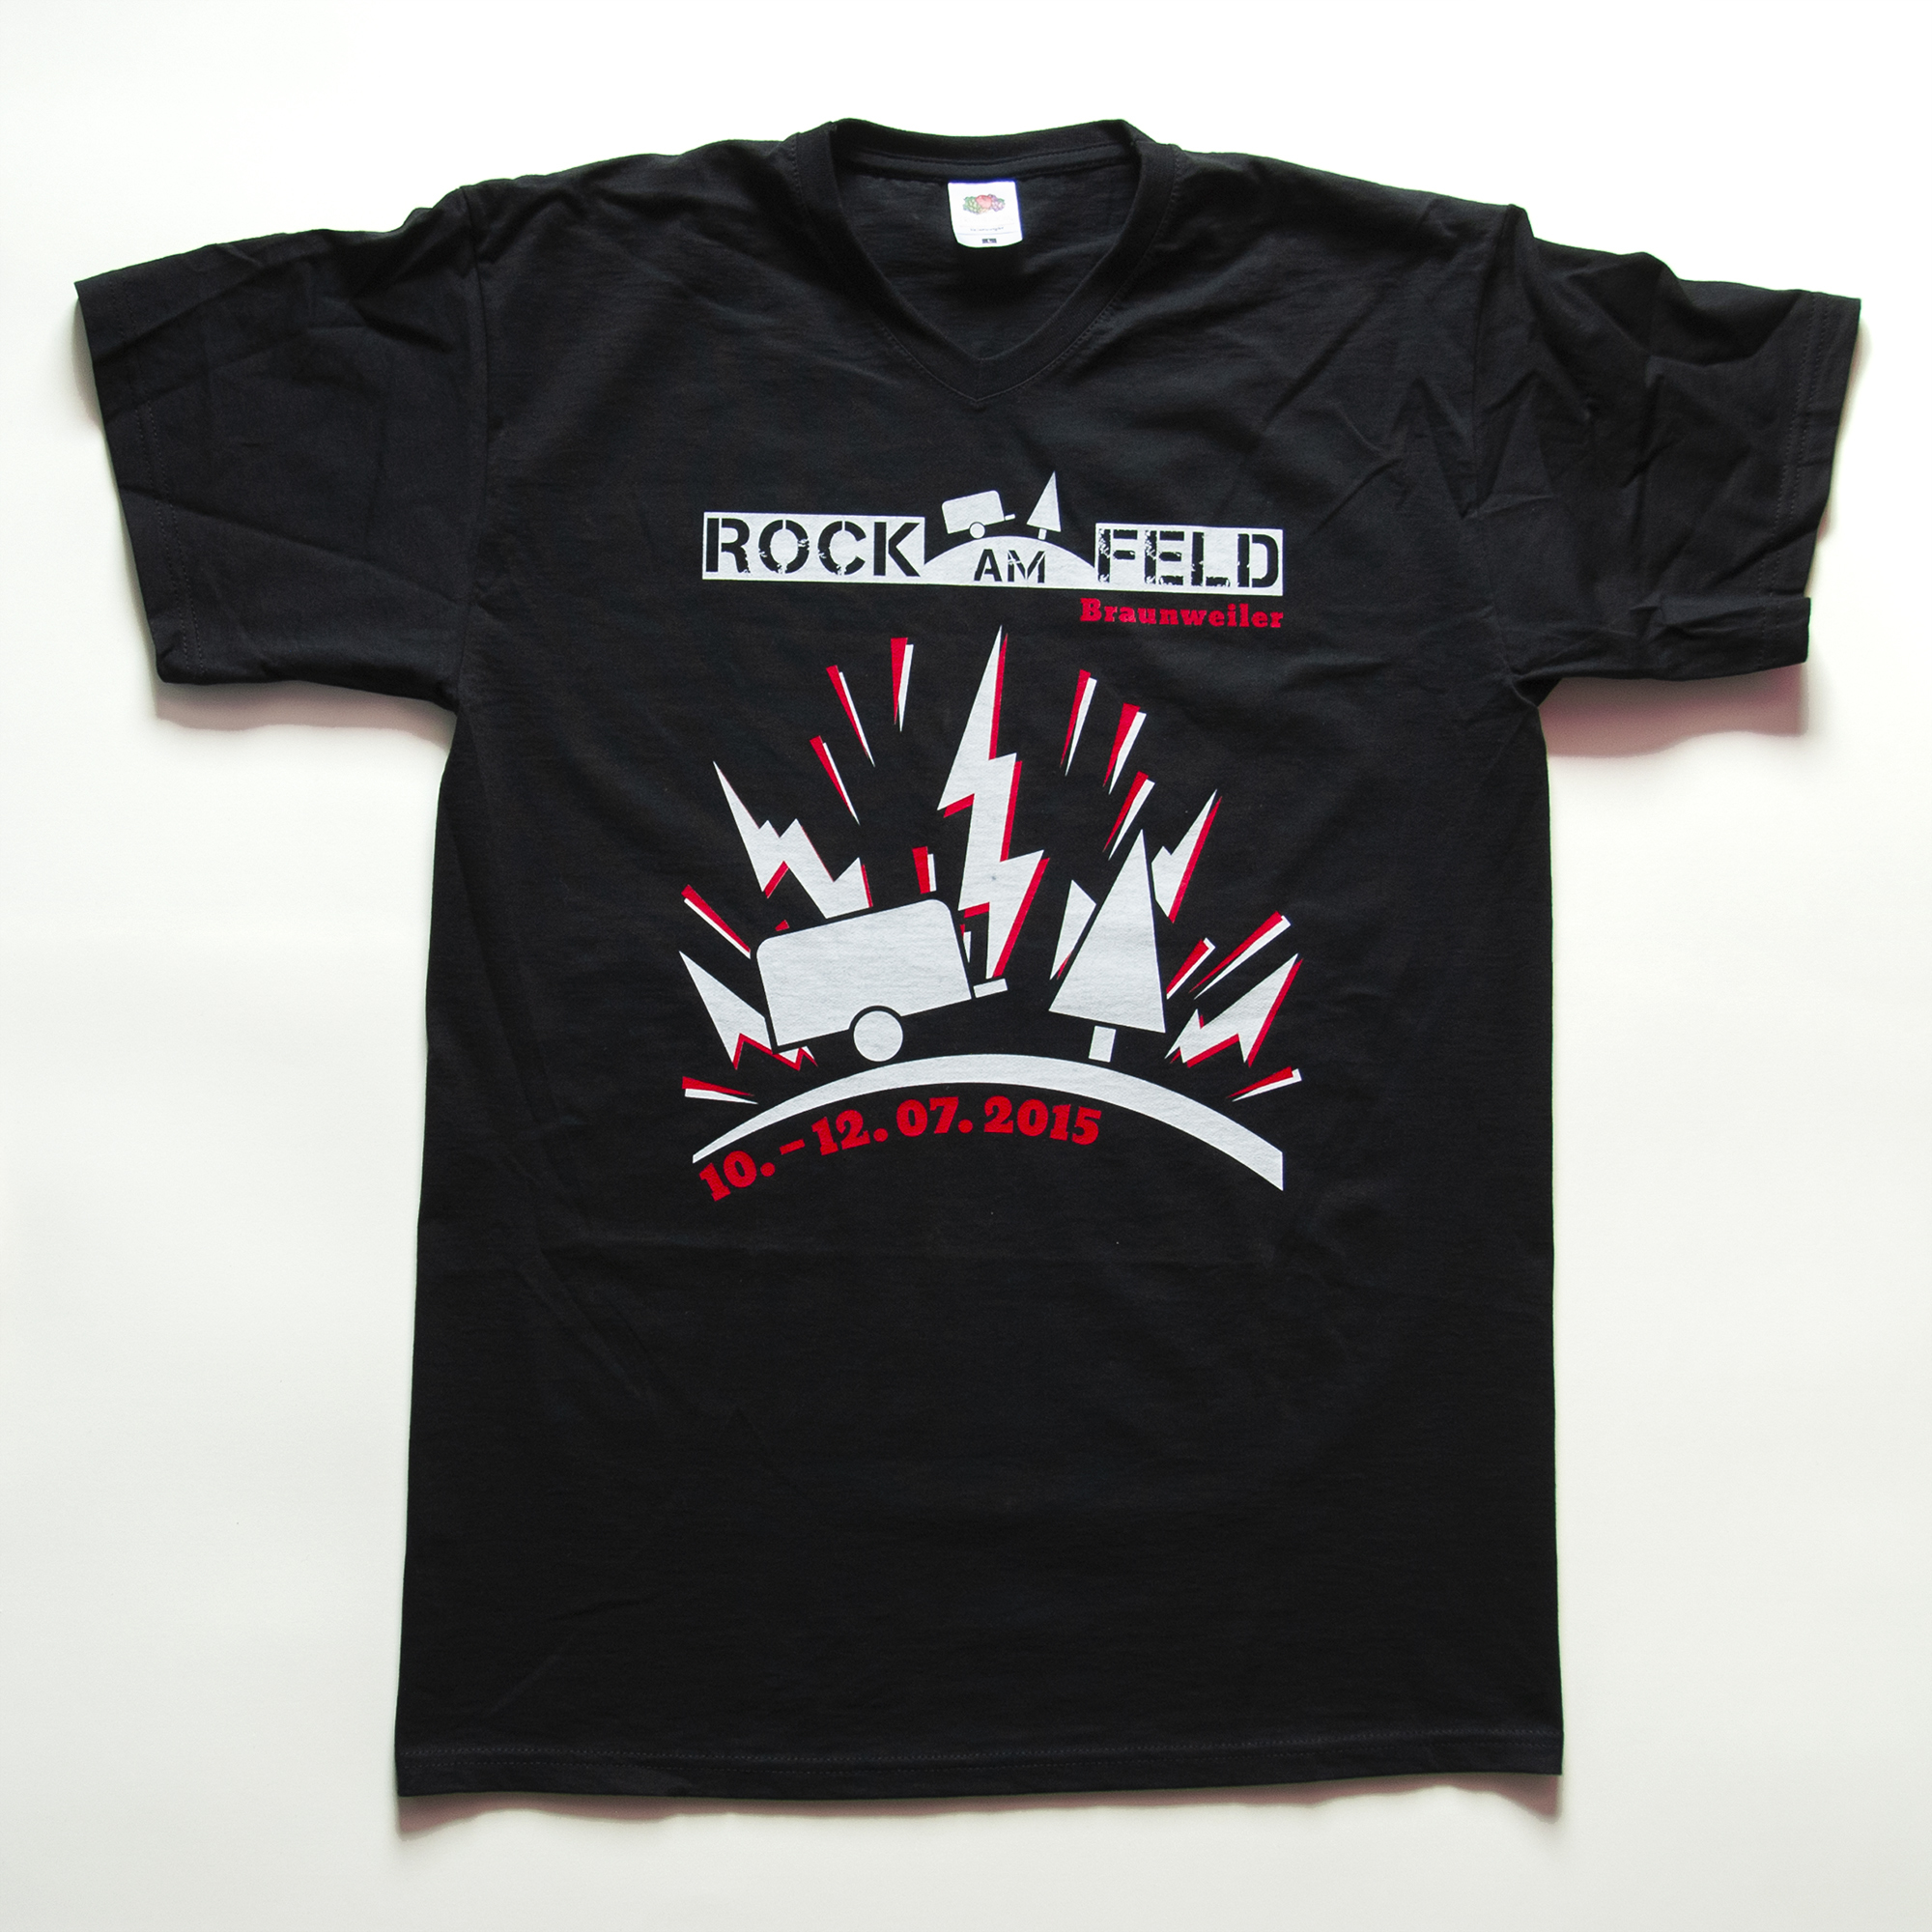 Rock am Feld Shirt 2015 2015-M